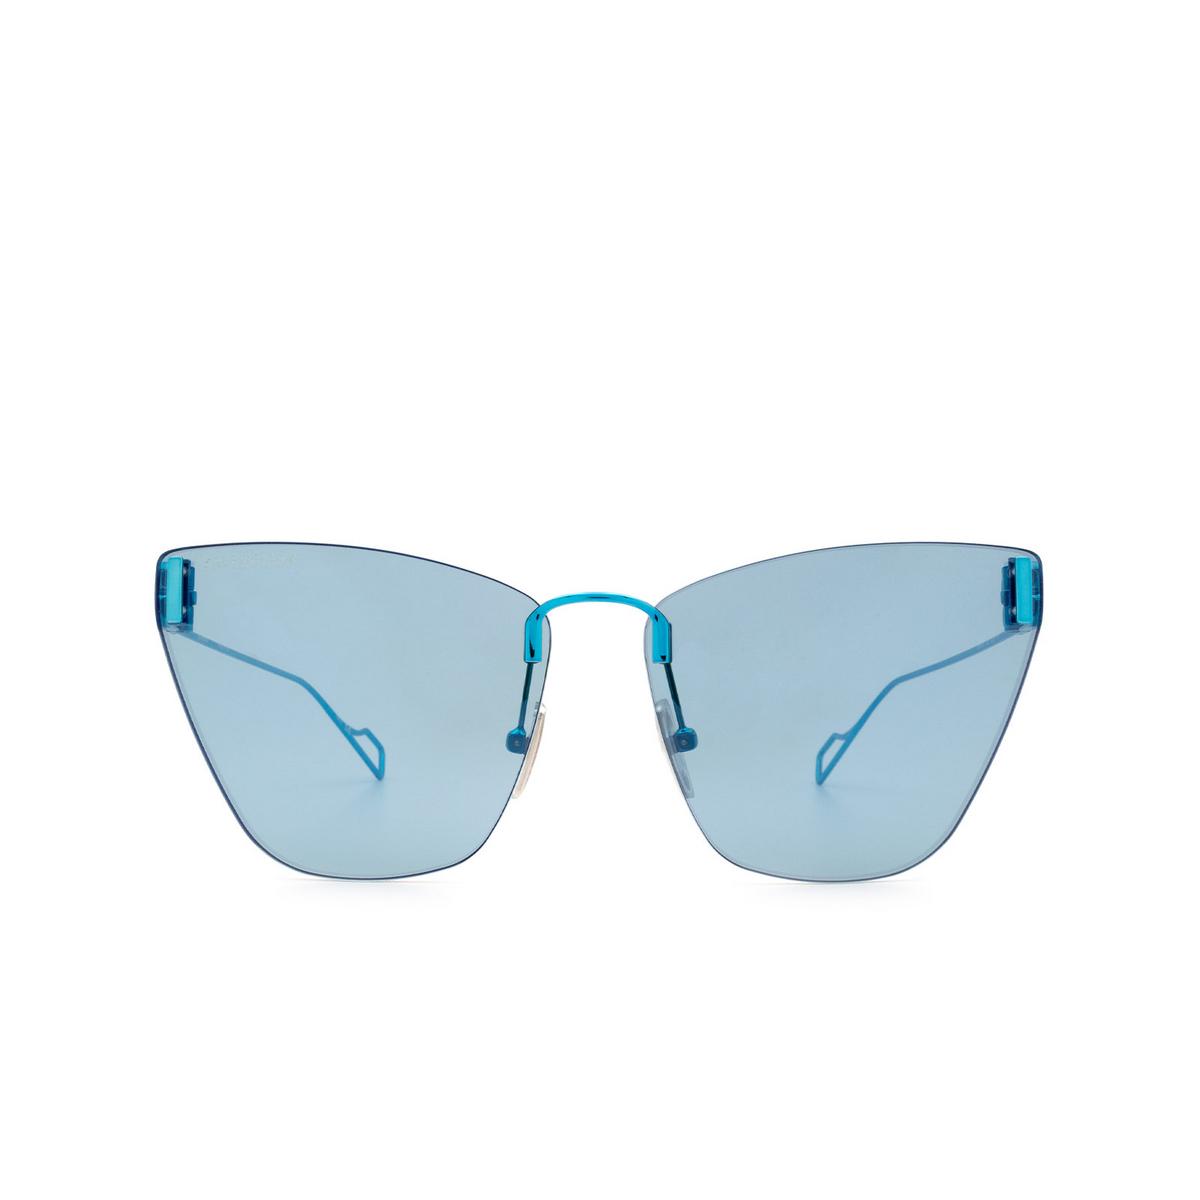 Balenciaga® Cat-eye Sunglasses: BB0111S color Light-blue 003 - 1/3.